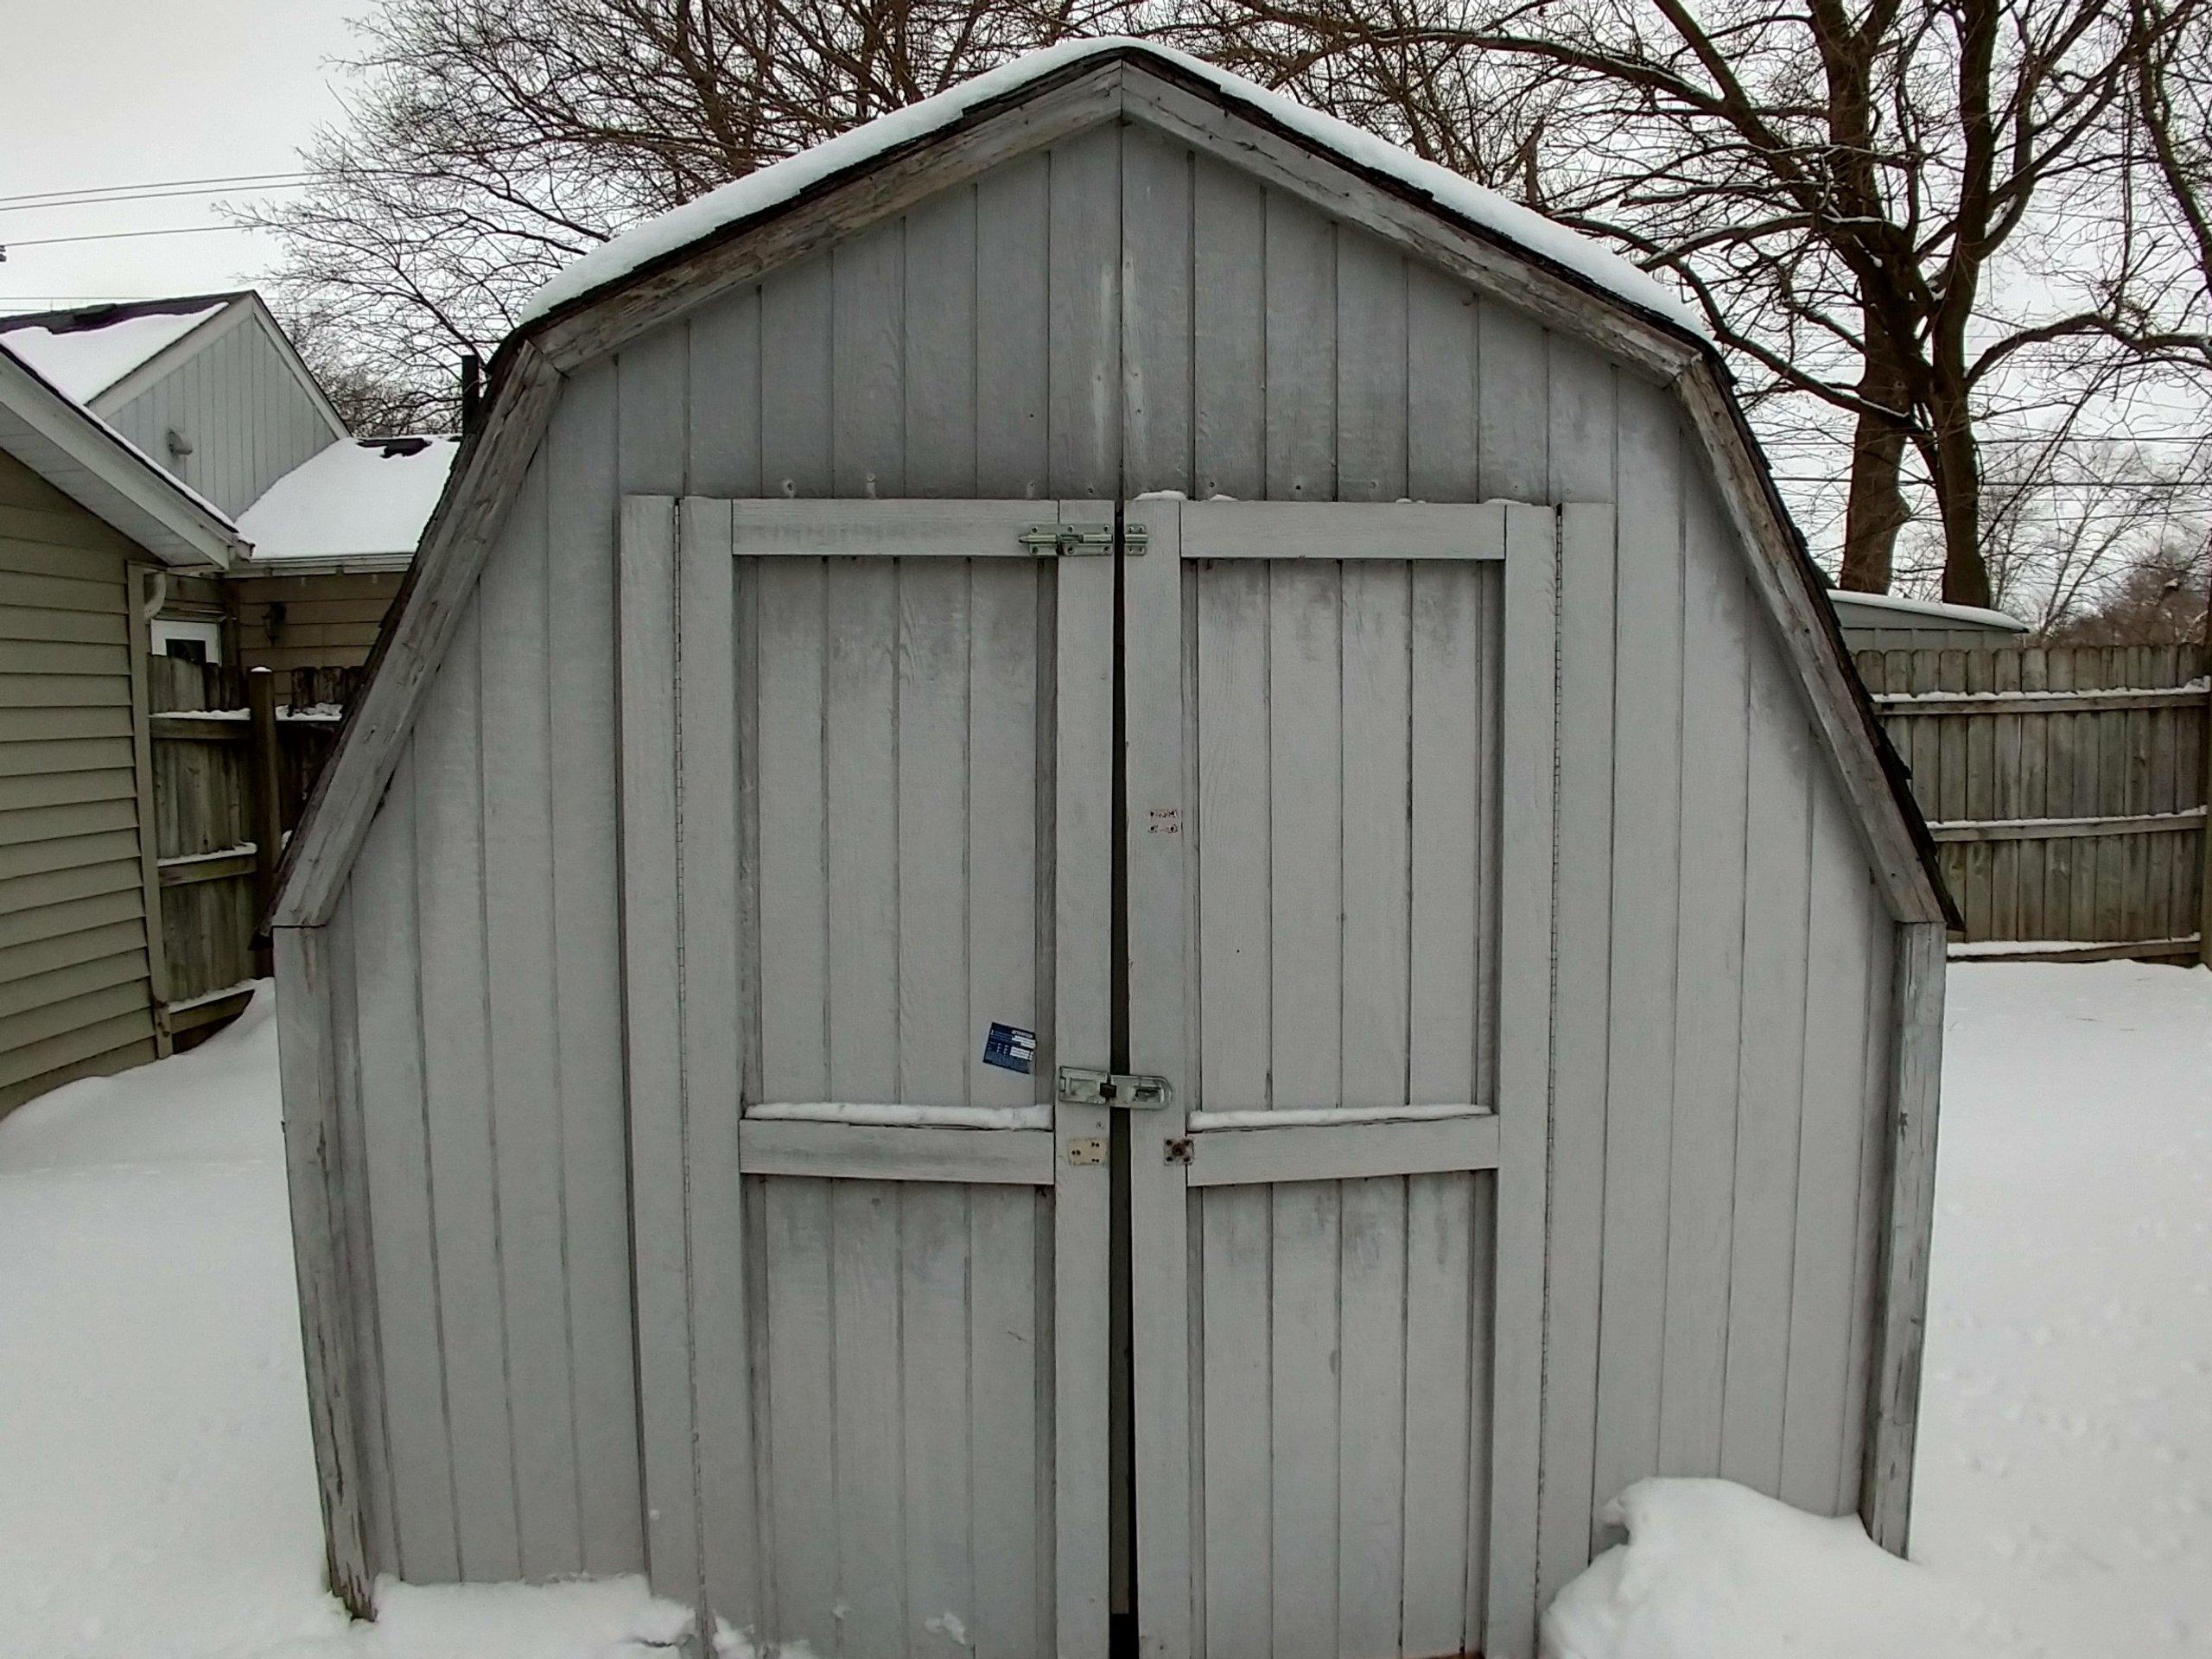 8x8 Shed self storage unit